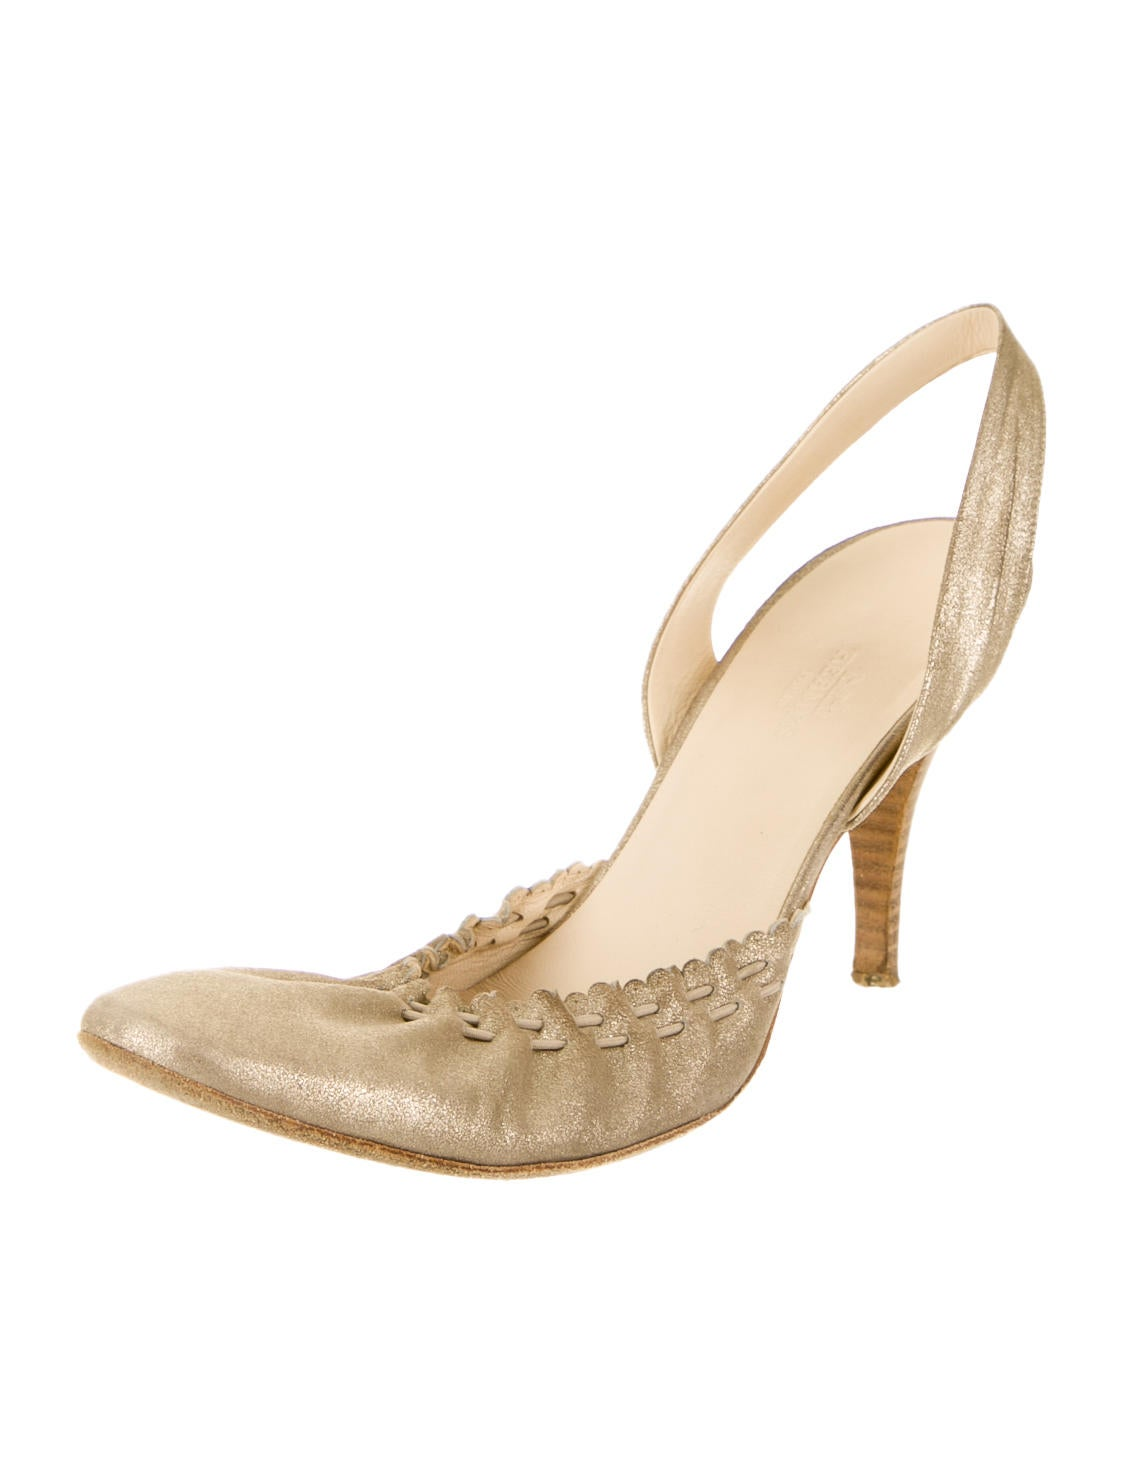 hermes women shoes - photo #30